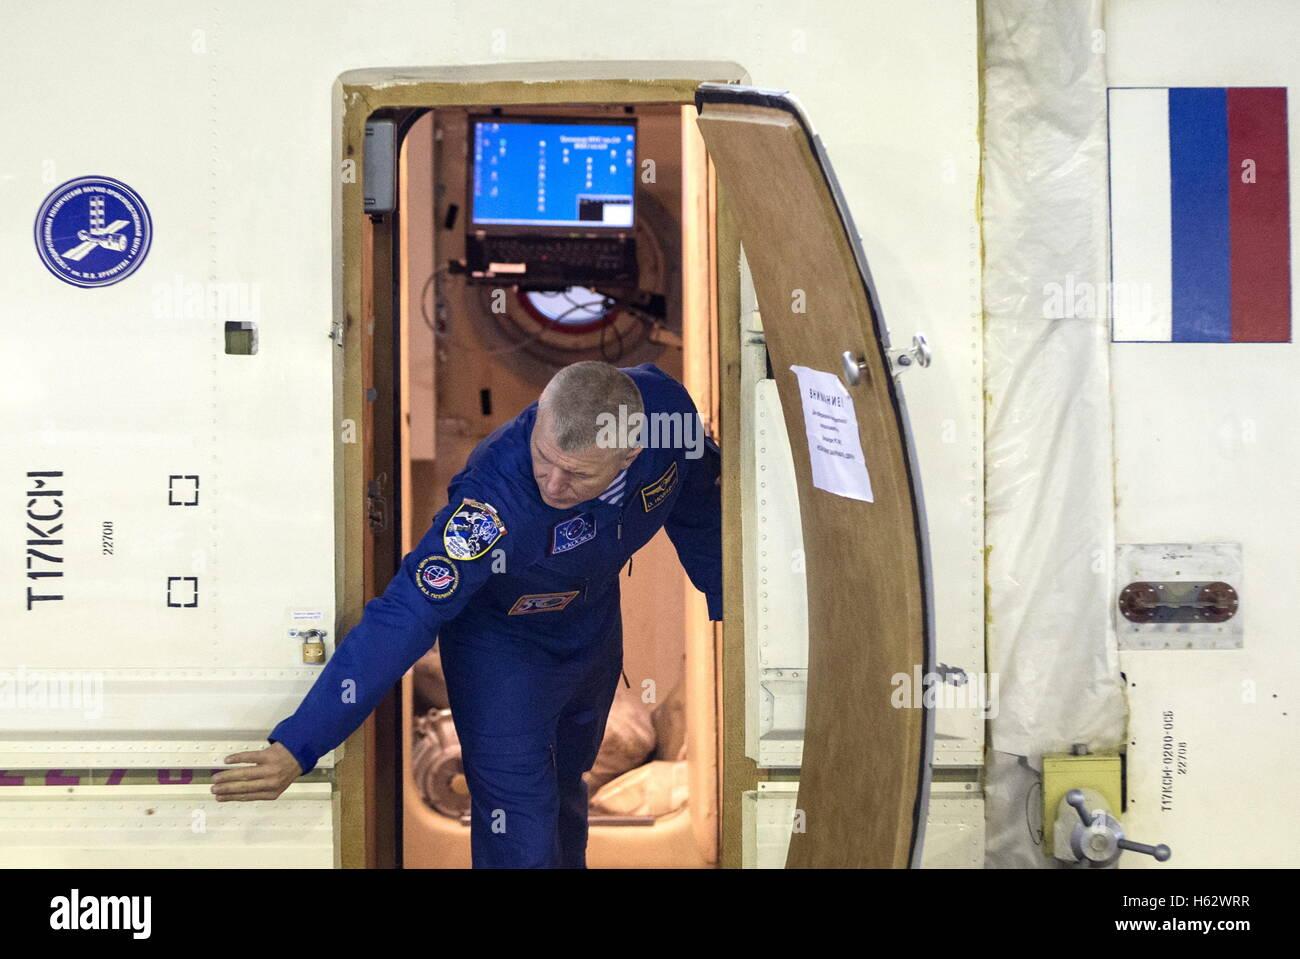 Moscow Region, Russia. 24th Oct, 2016. ISS Expedition 49/50 main crew member, cosmonaut Oleg Novitsky (Roscosmos) - Stock Image